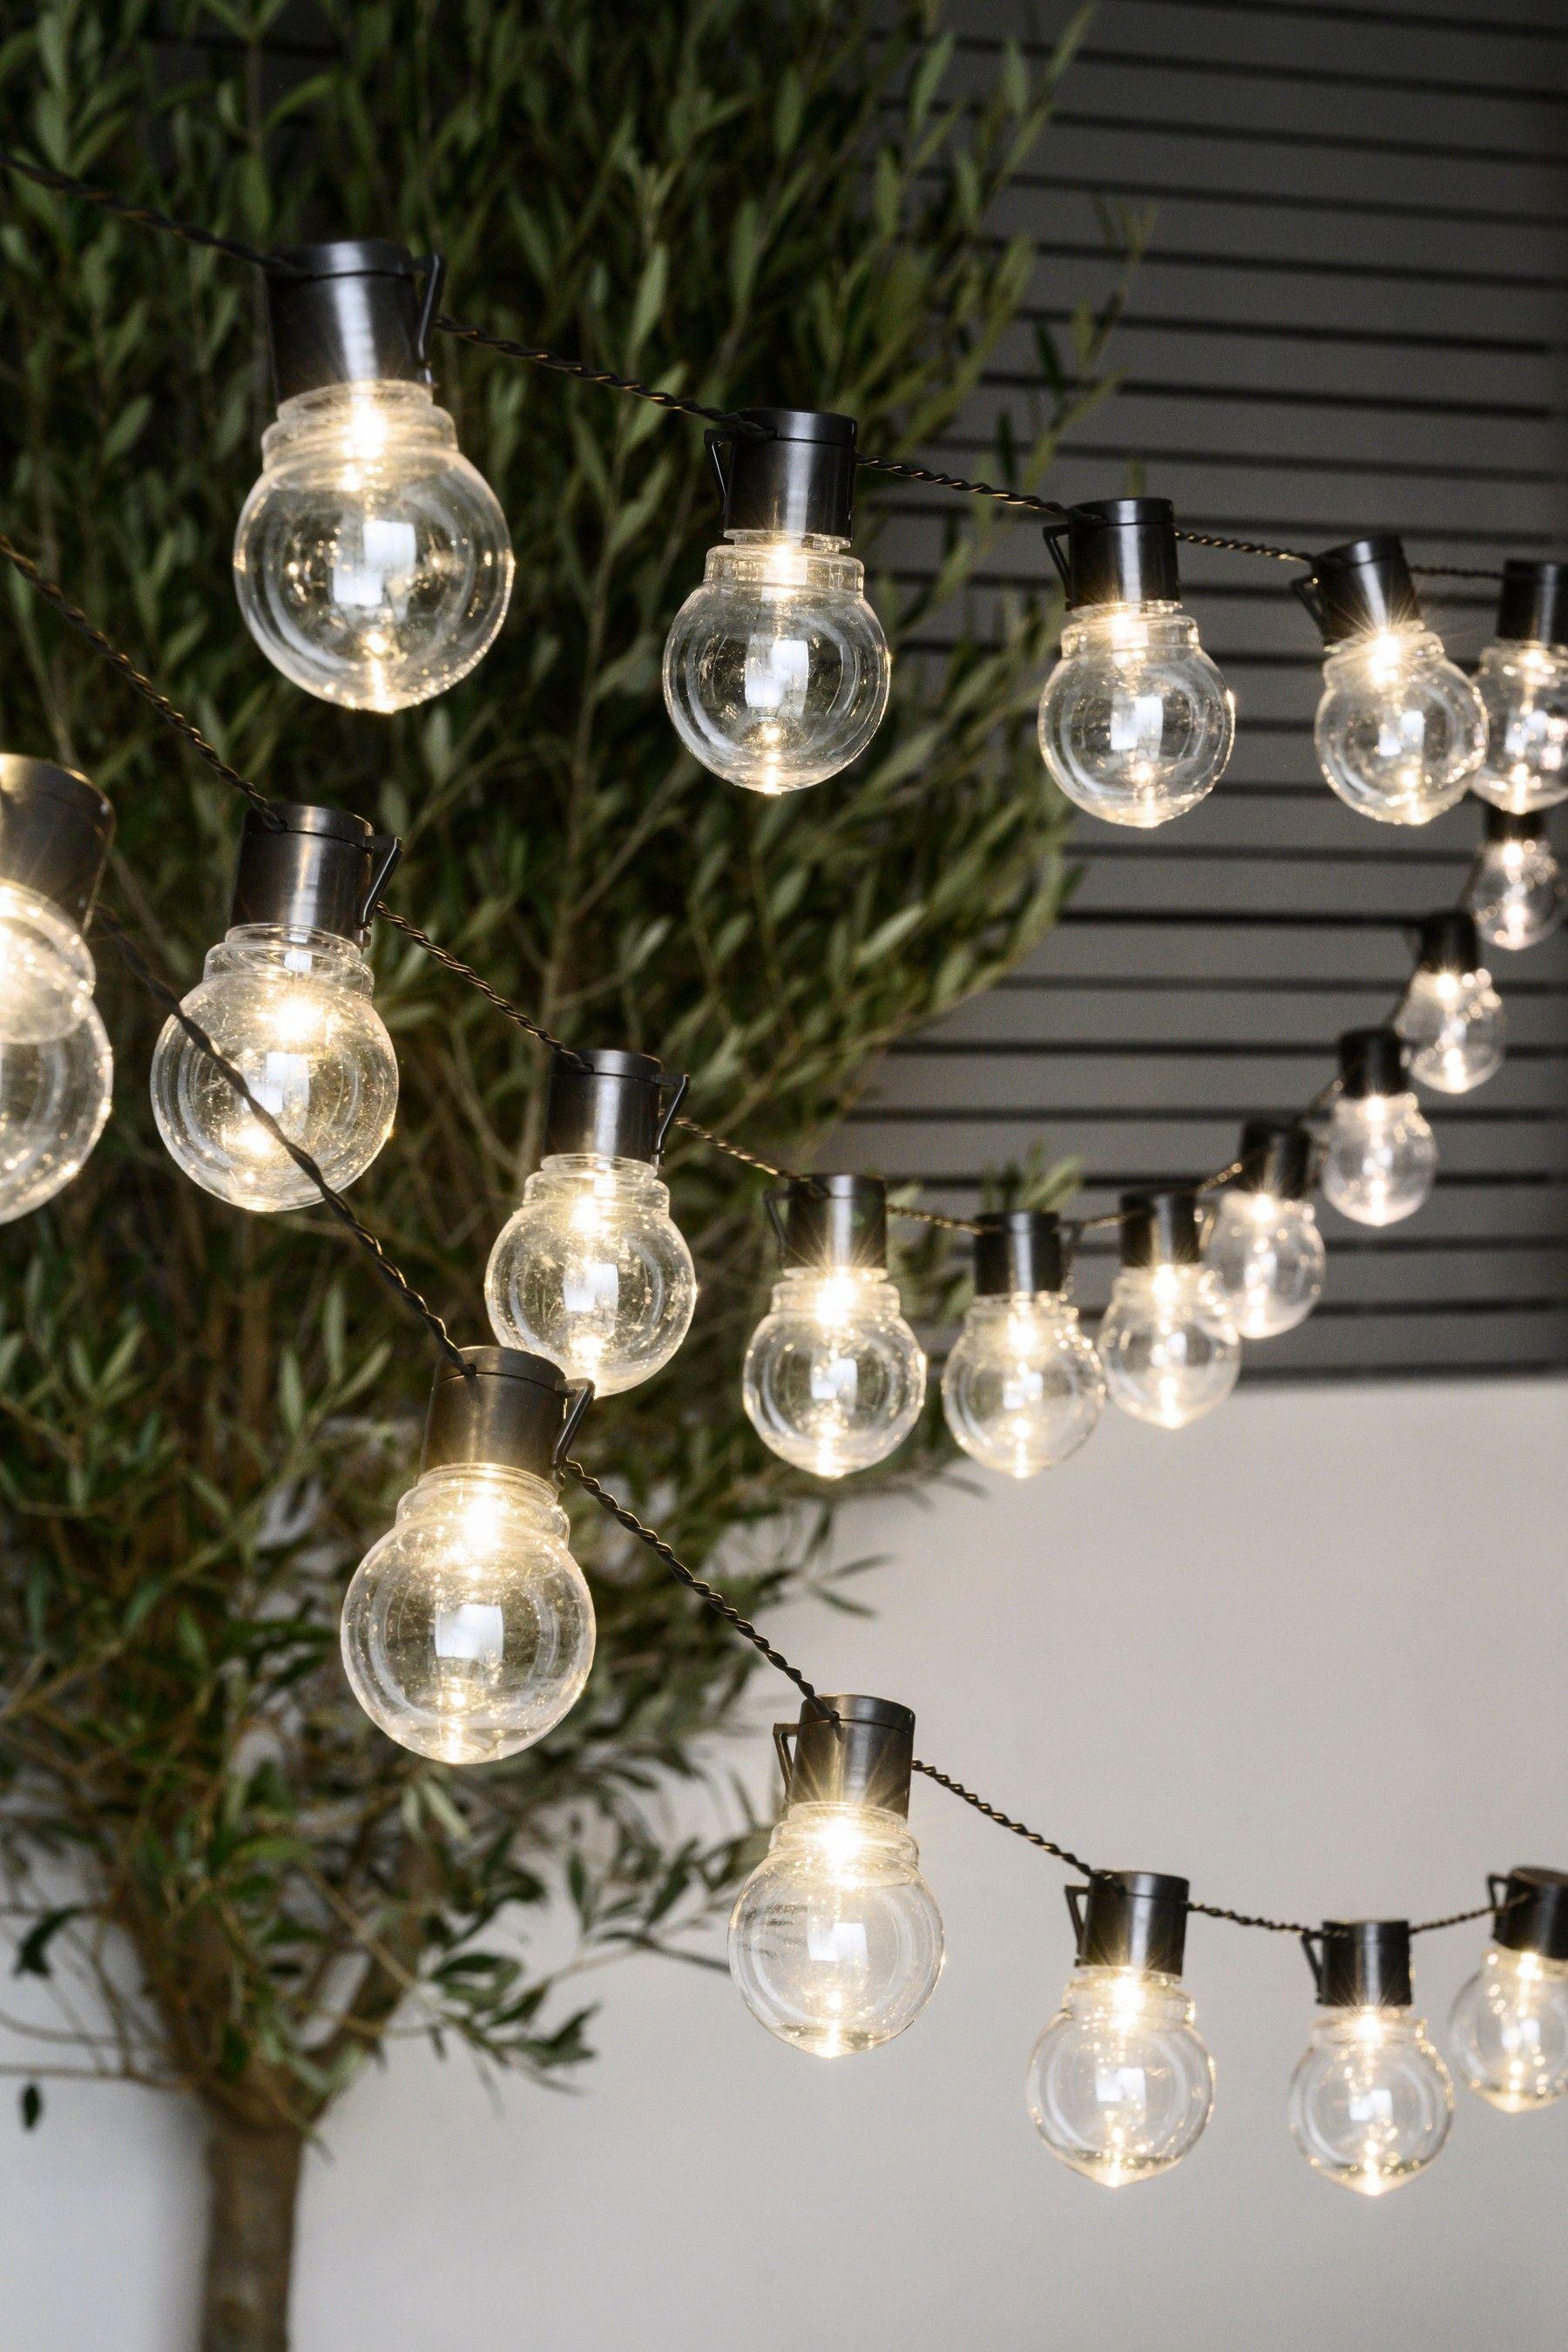 Next Mains Powered 40 Festoon Lights Black In 2020 Festoon Festoon Lighting Line Light